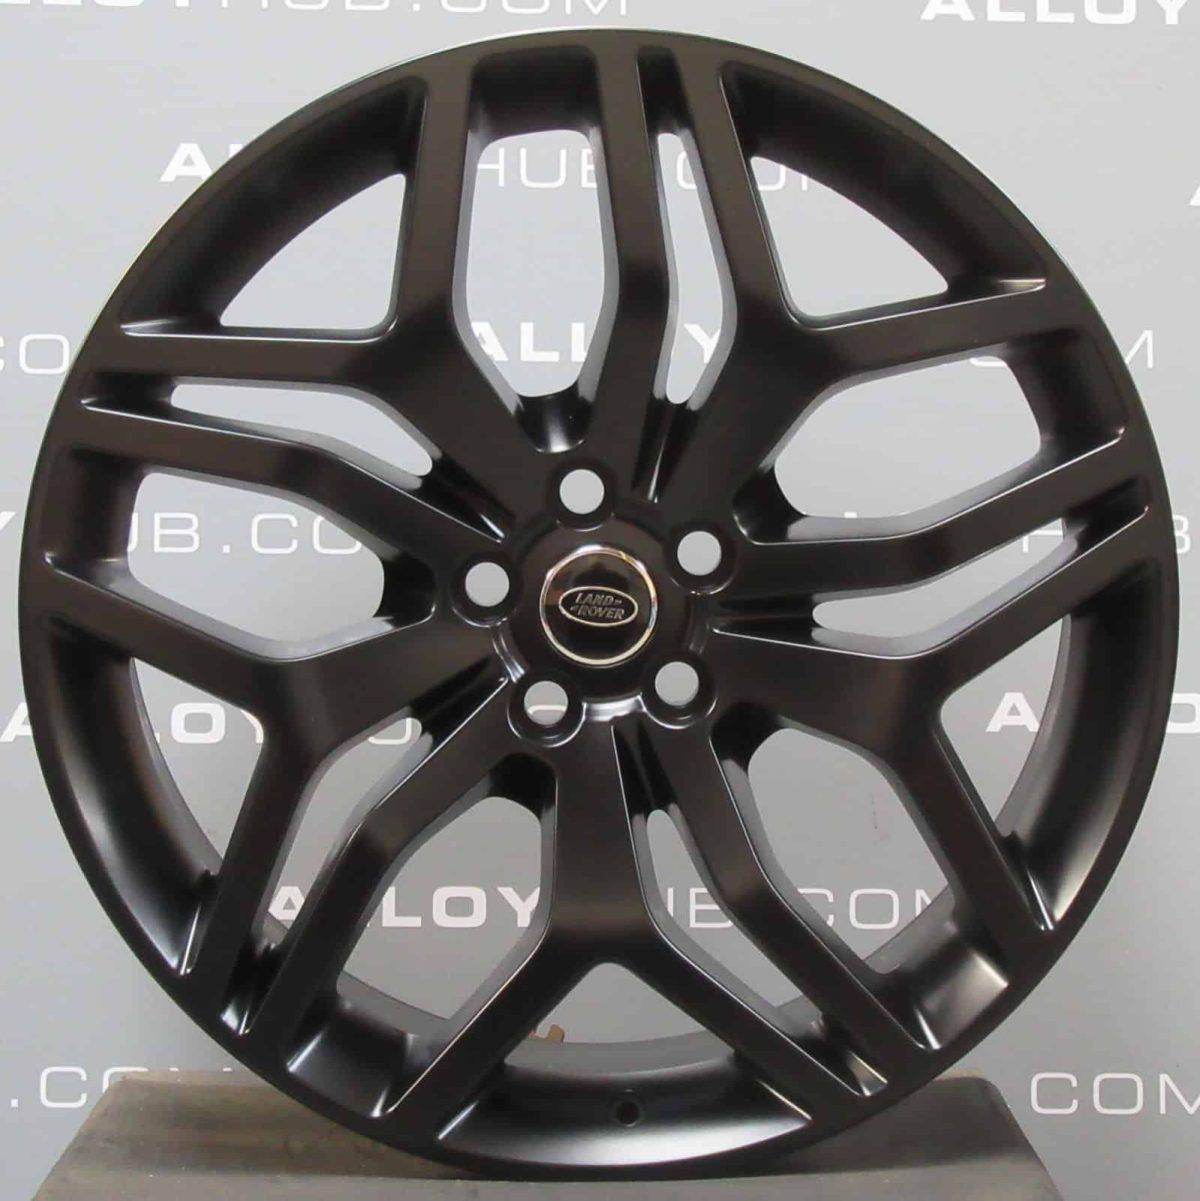 "Genuine Land Rover Range Rover Style 5008 Style 17 22"" inch 5 Split-Spoke Satin Black Alloy Wheels LR044839"